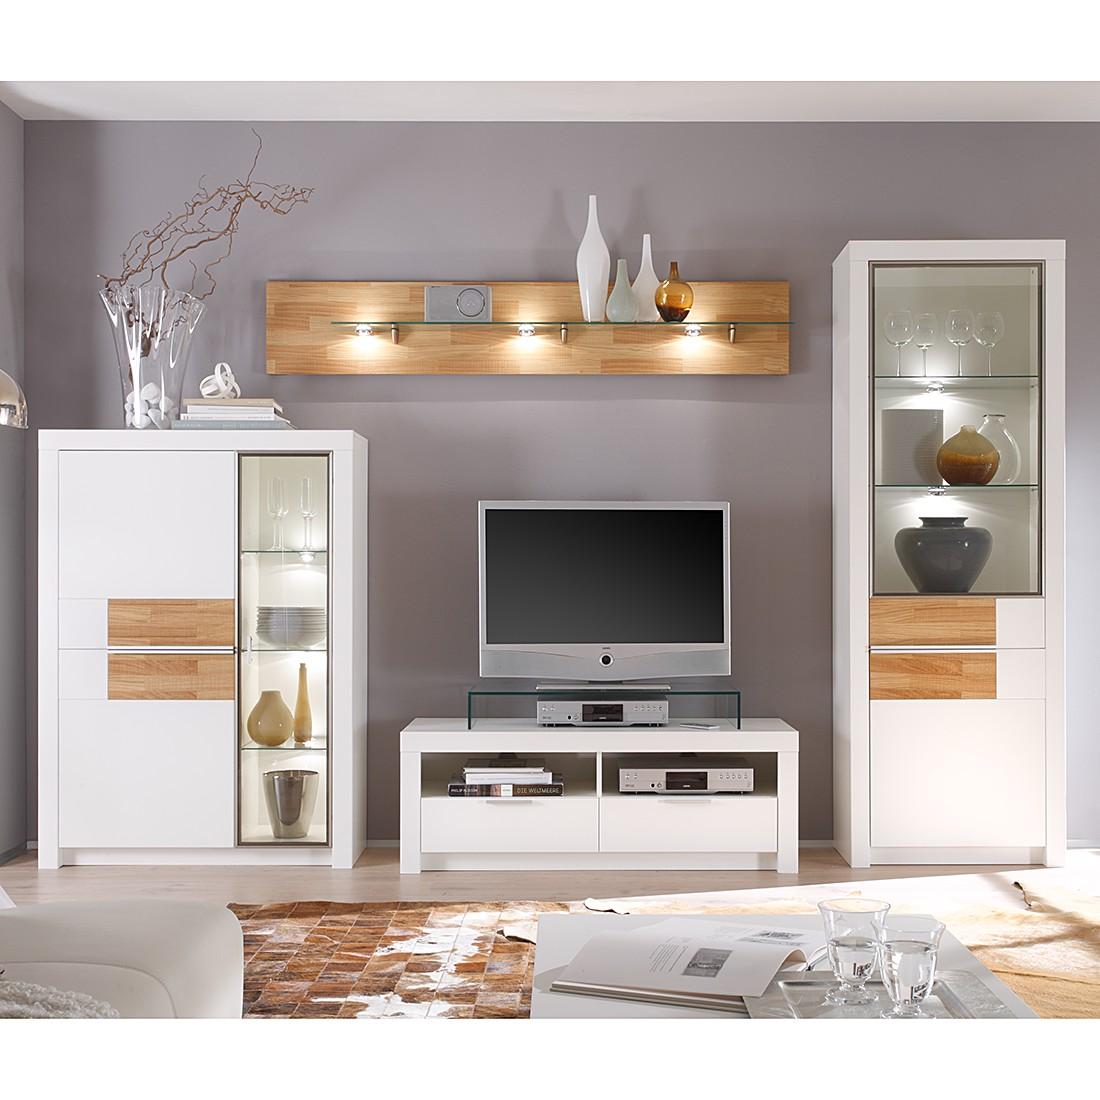 wohnwand cantano ii 4 teilig wei eiche furnier wohnwand 4 teilig ohne beleuchtung tv. Black Bedroom Furniture Sets. Home Design Ideas